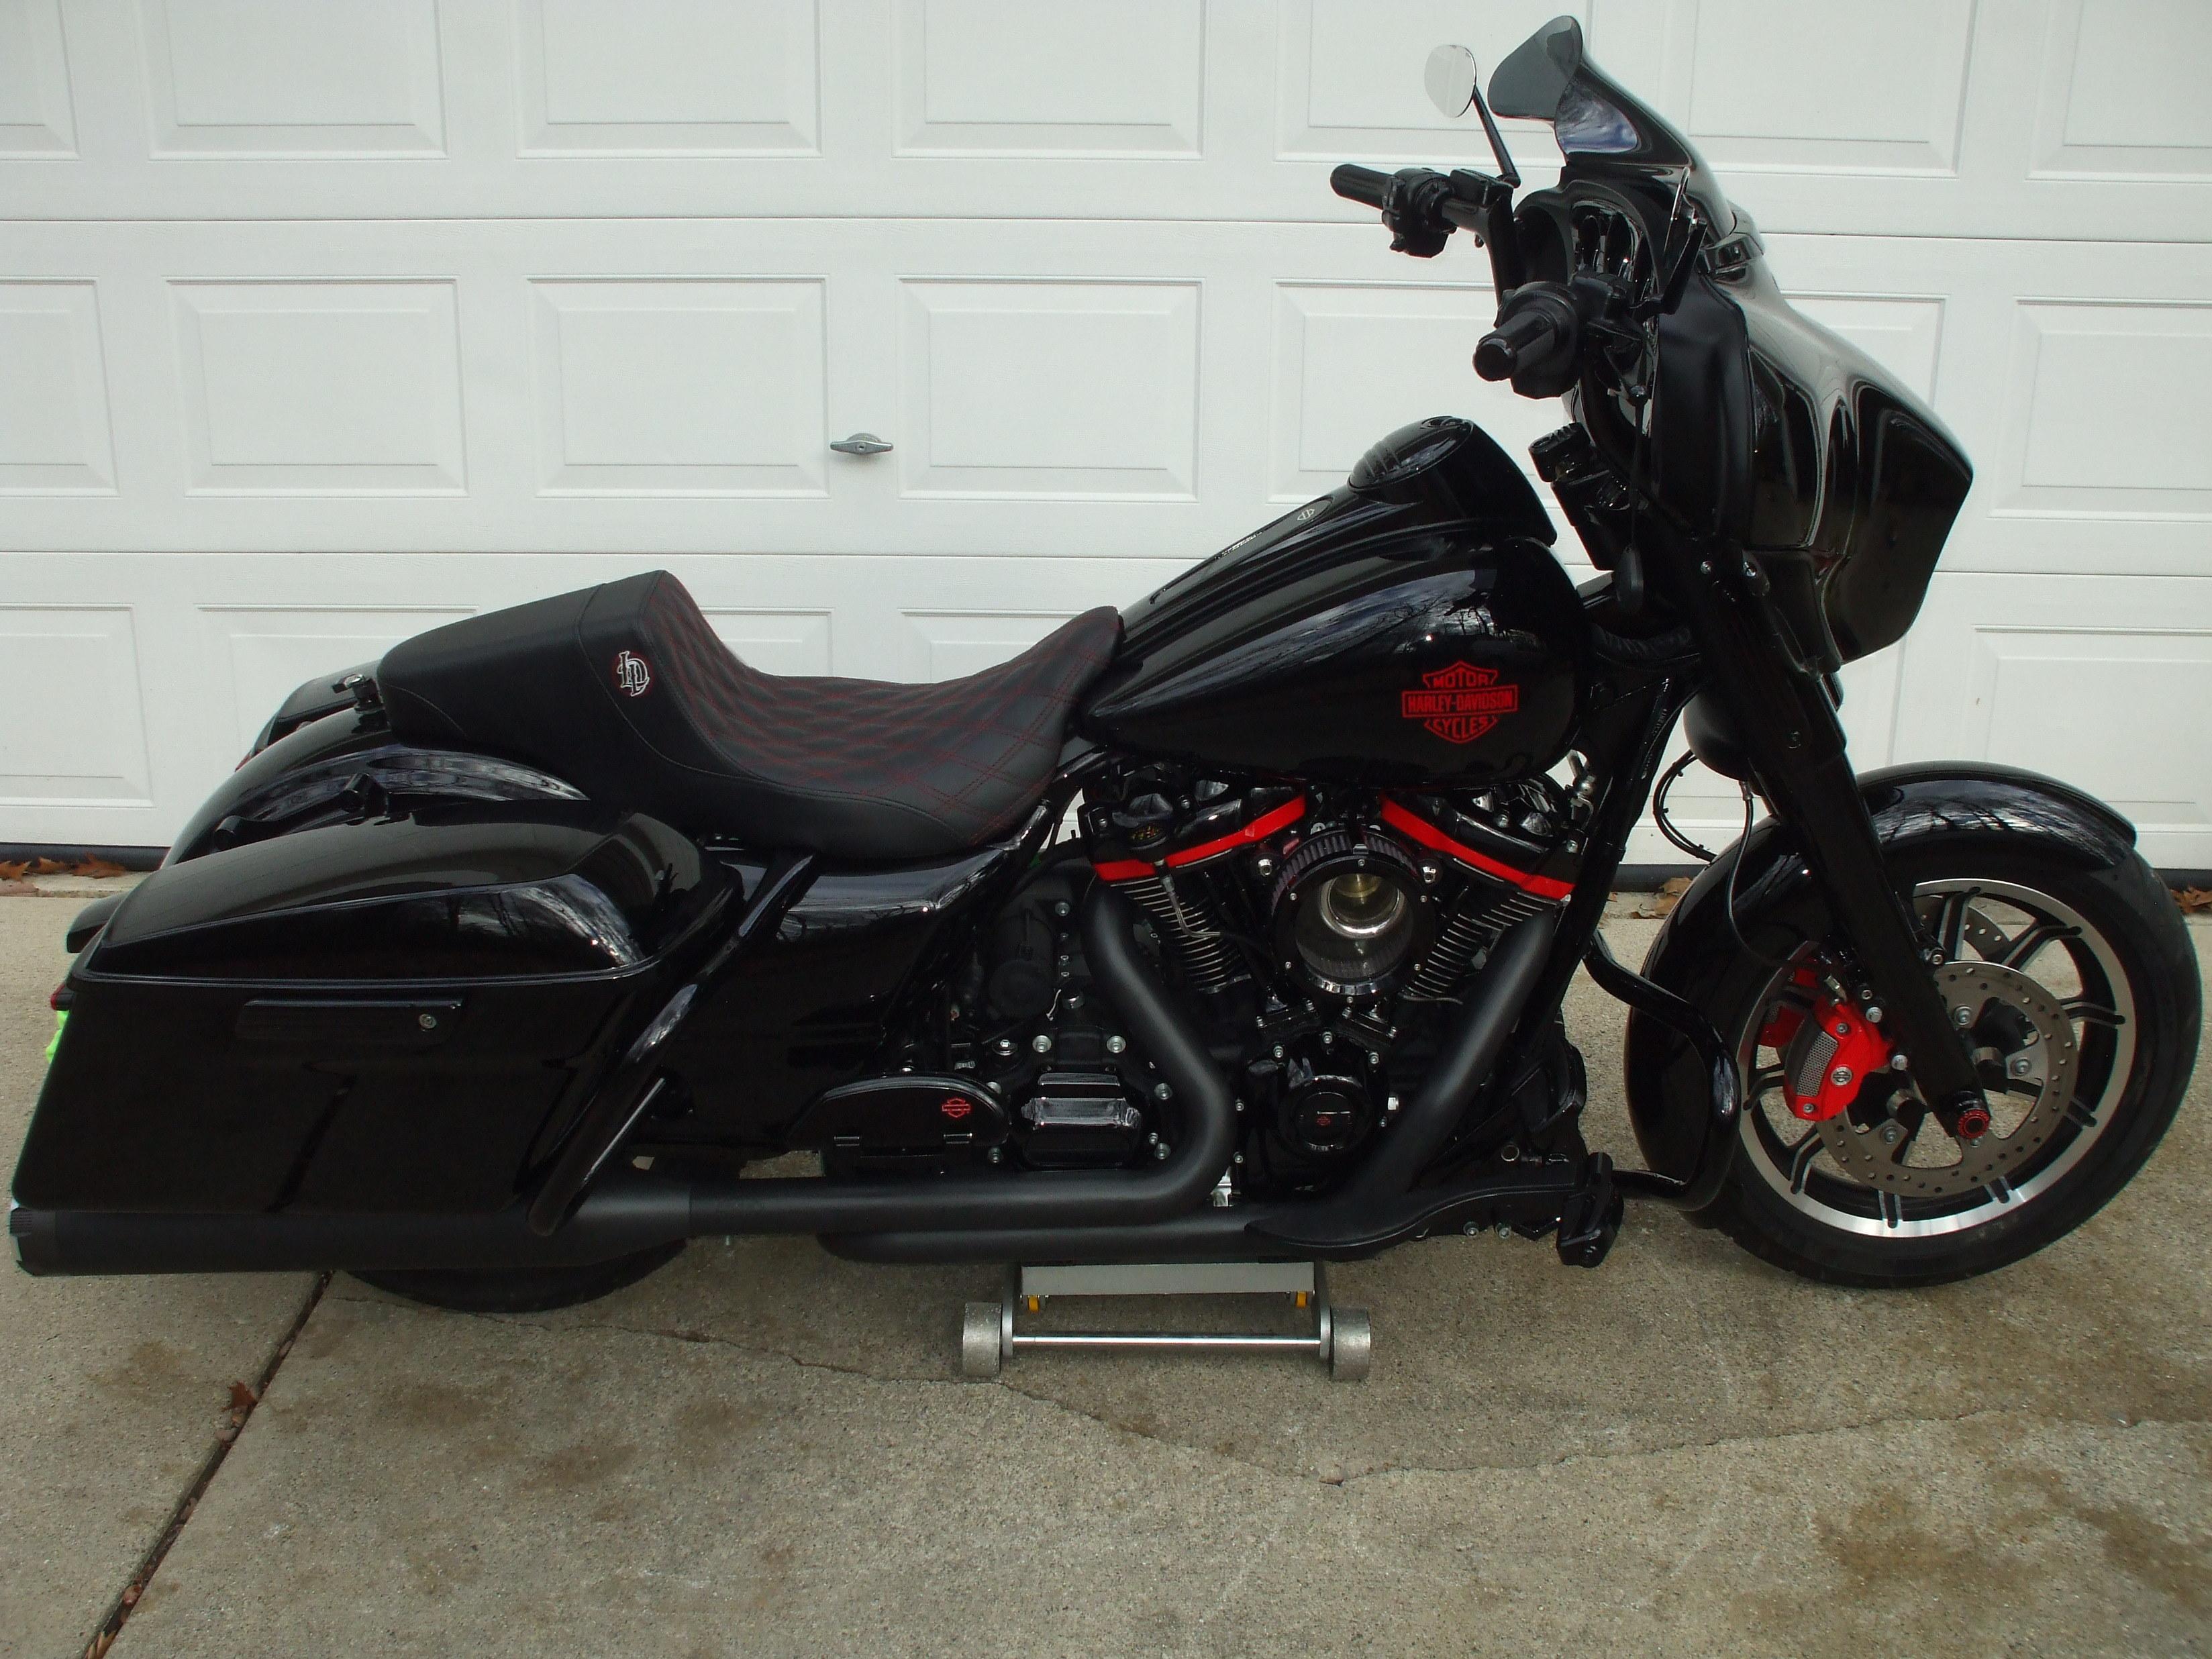 Photo 2020 Harley-Davidson ELECTRA GLIDE STANDARD $481.32481.32